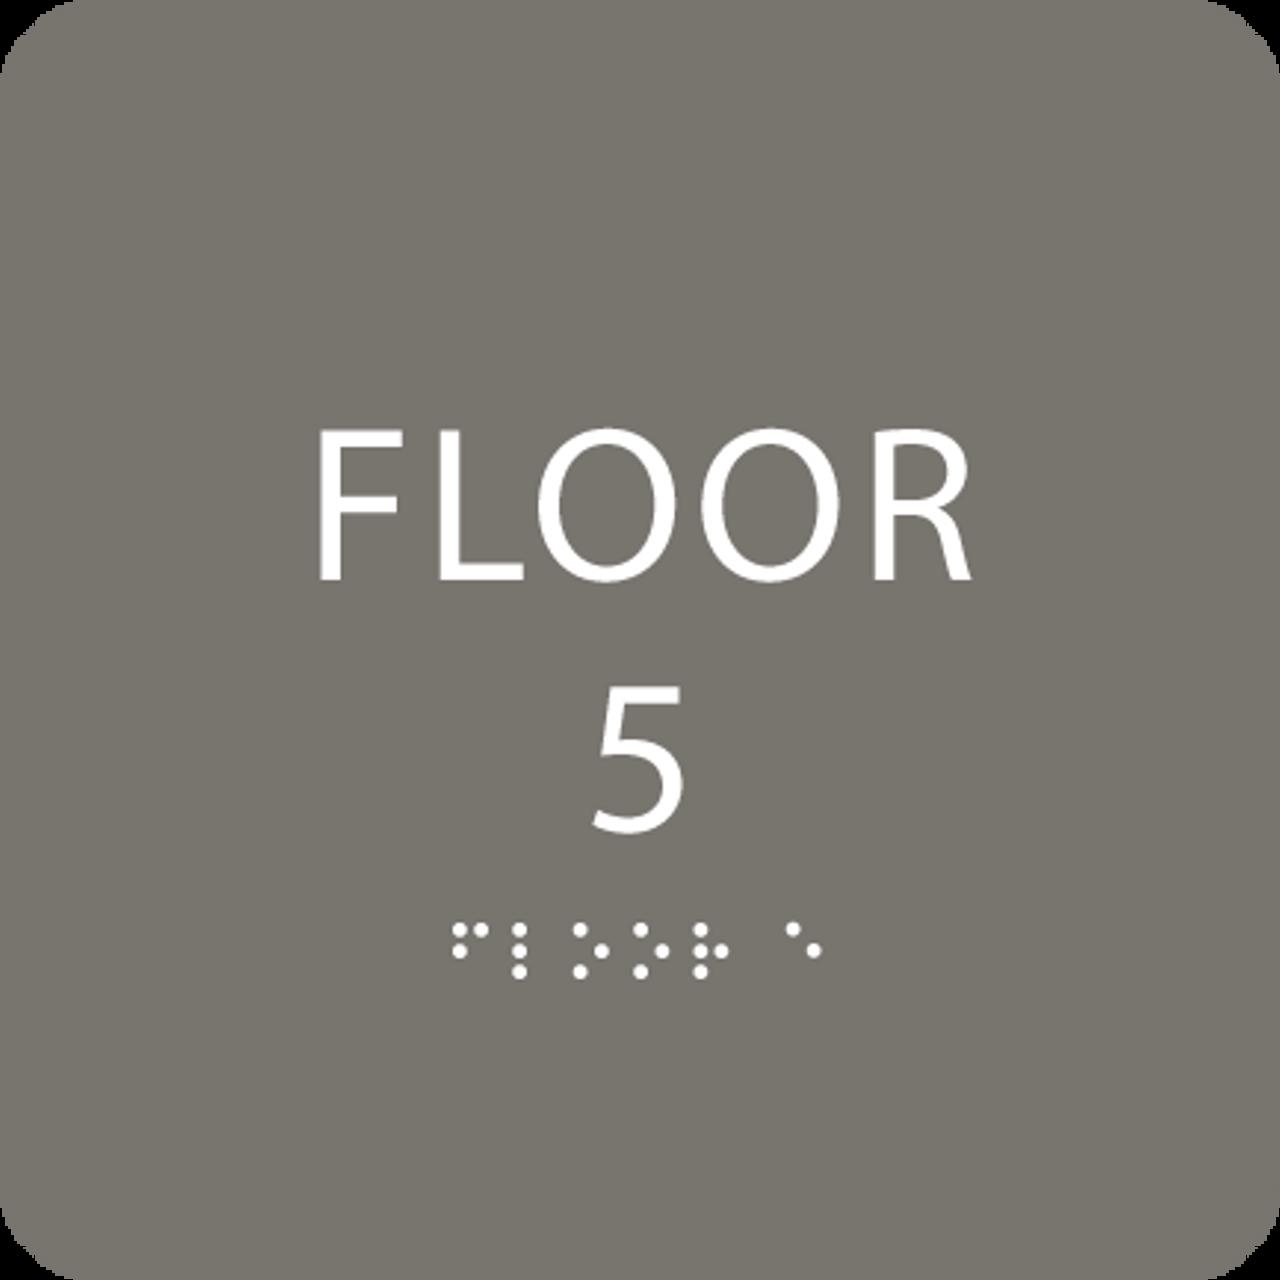 Dark Grey Floor 5 Level Identification Sign